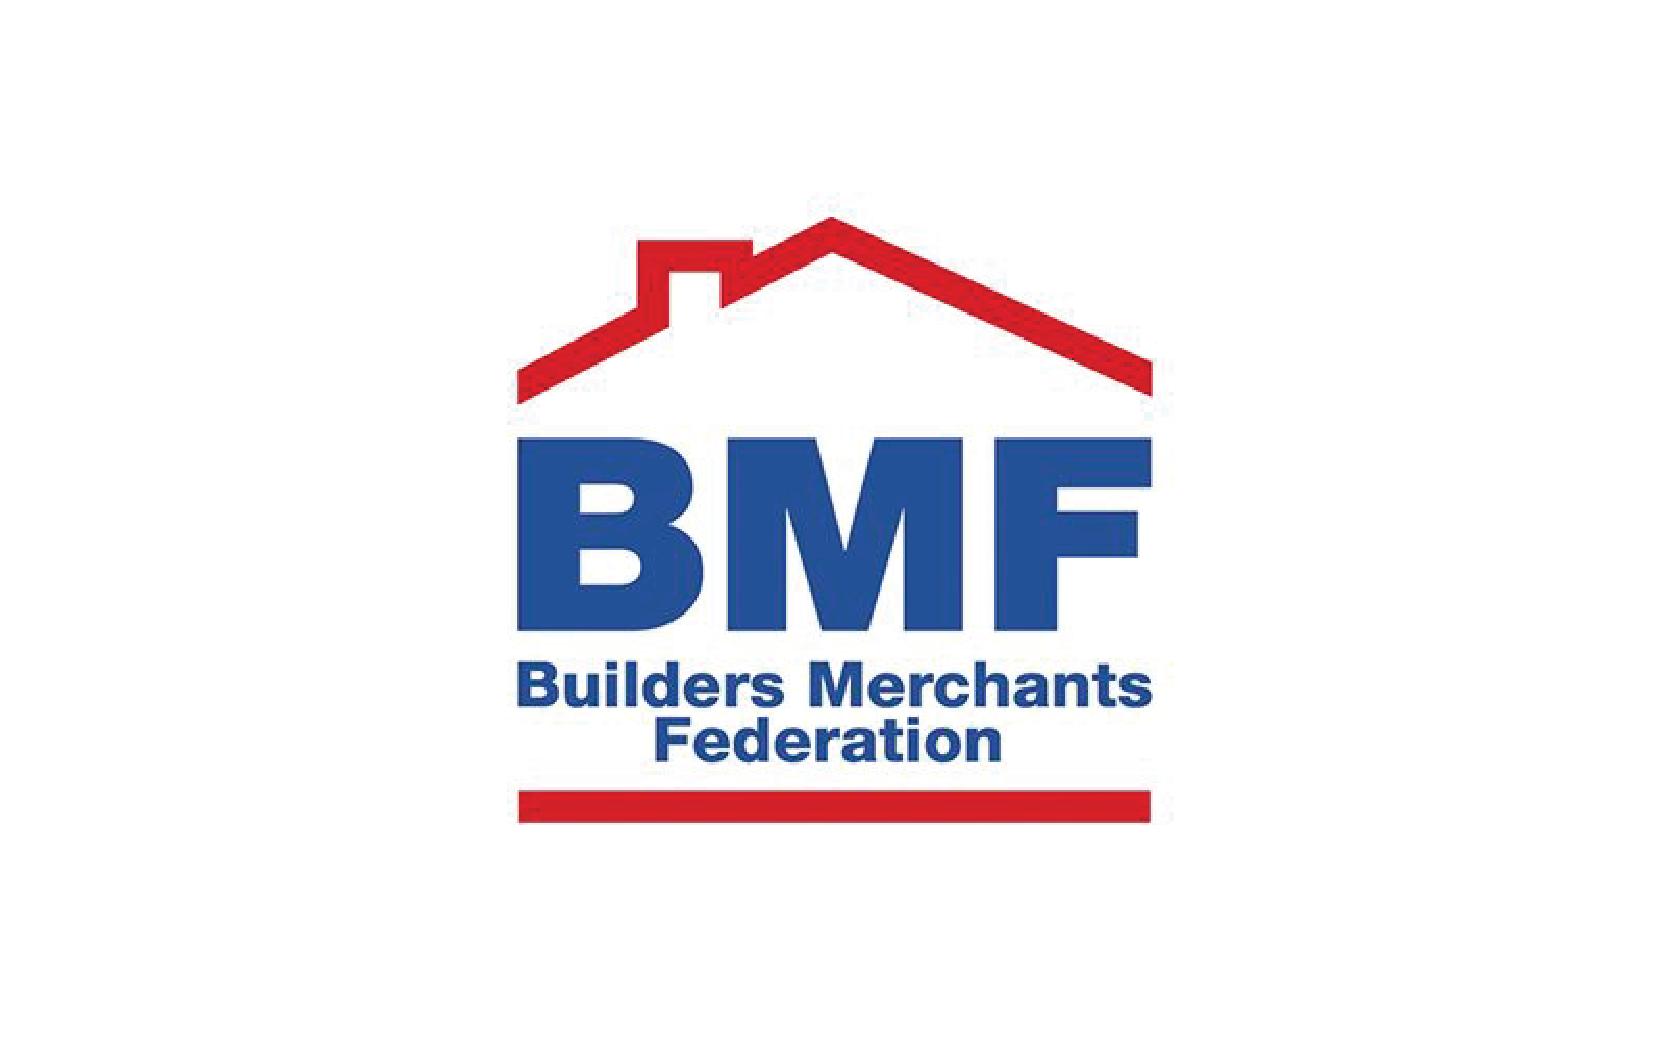 Builders Merchants Federation